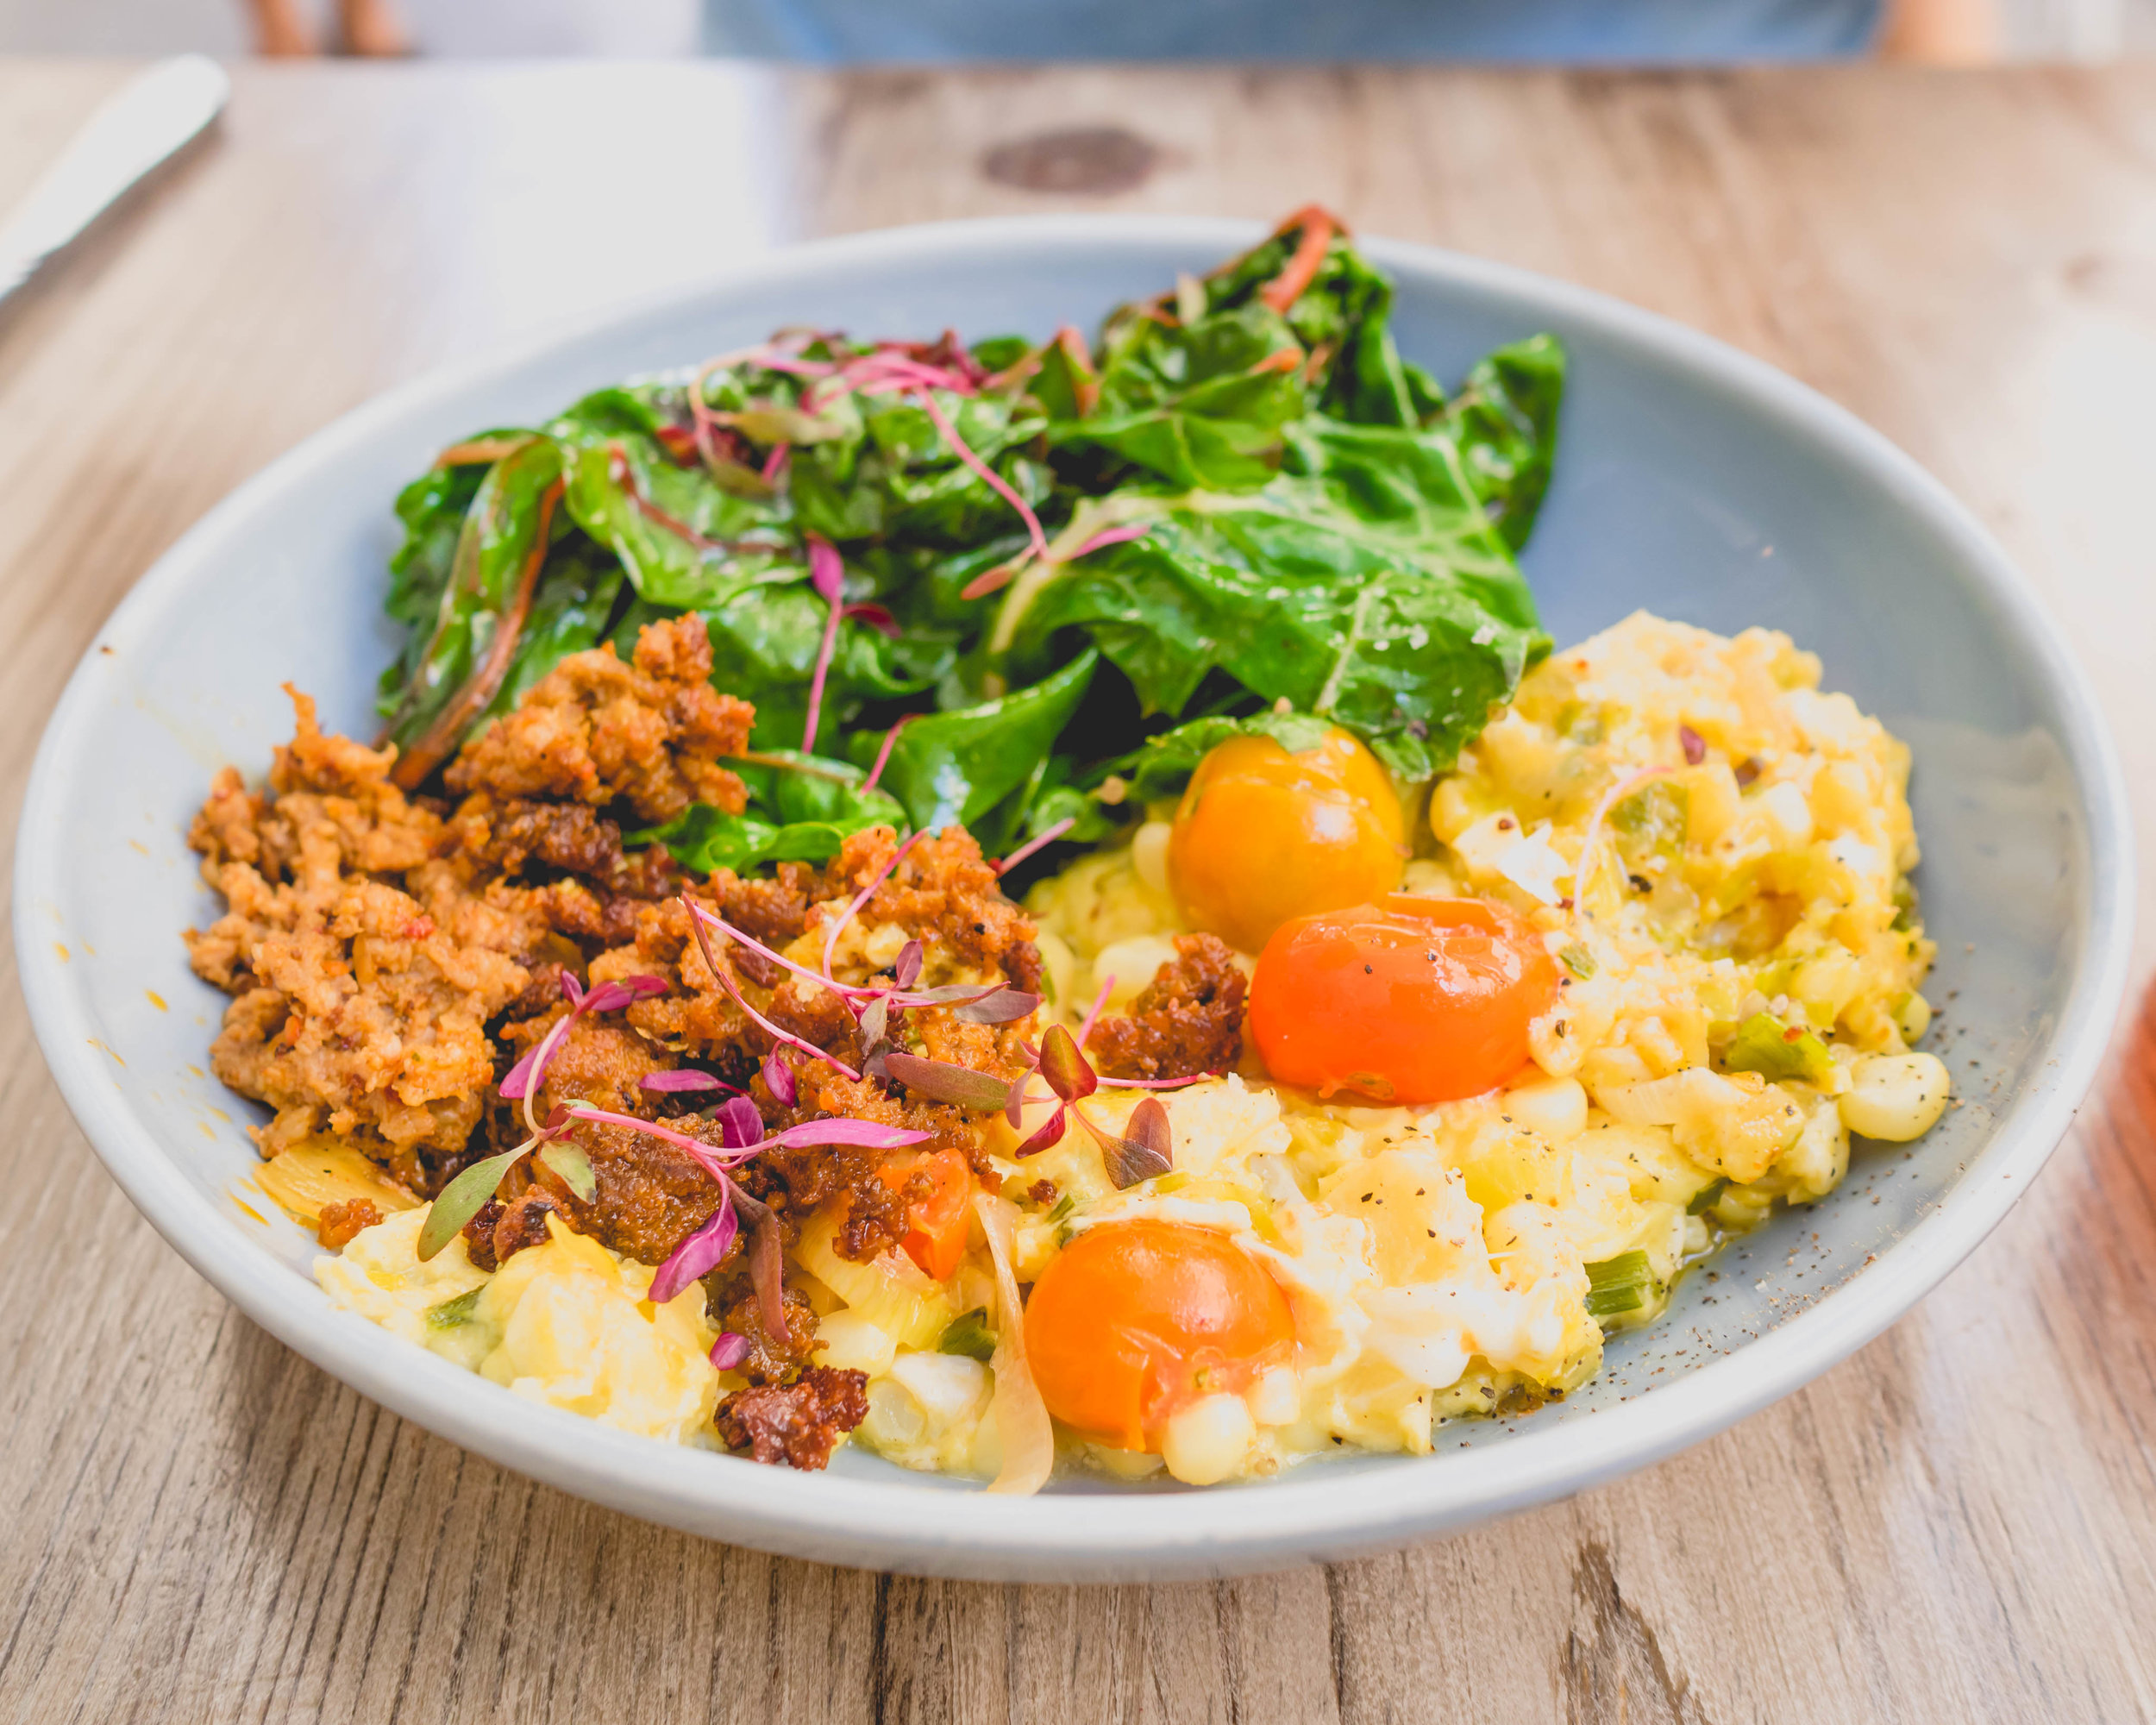 summer scramble : soft-scrambled farm eggs, house made chorizo, corn summer squash, tomatoes & basil with sauteed green on the side.